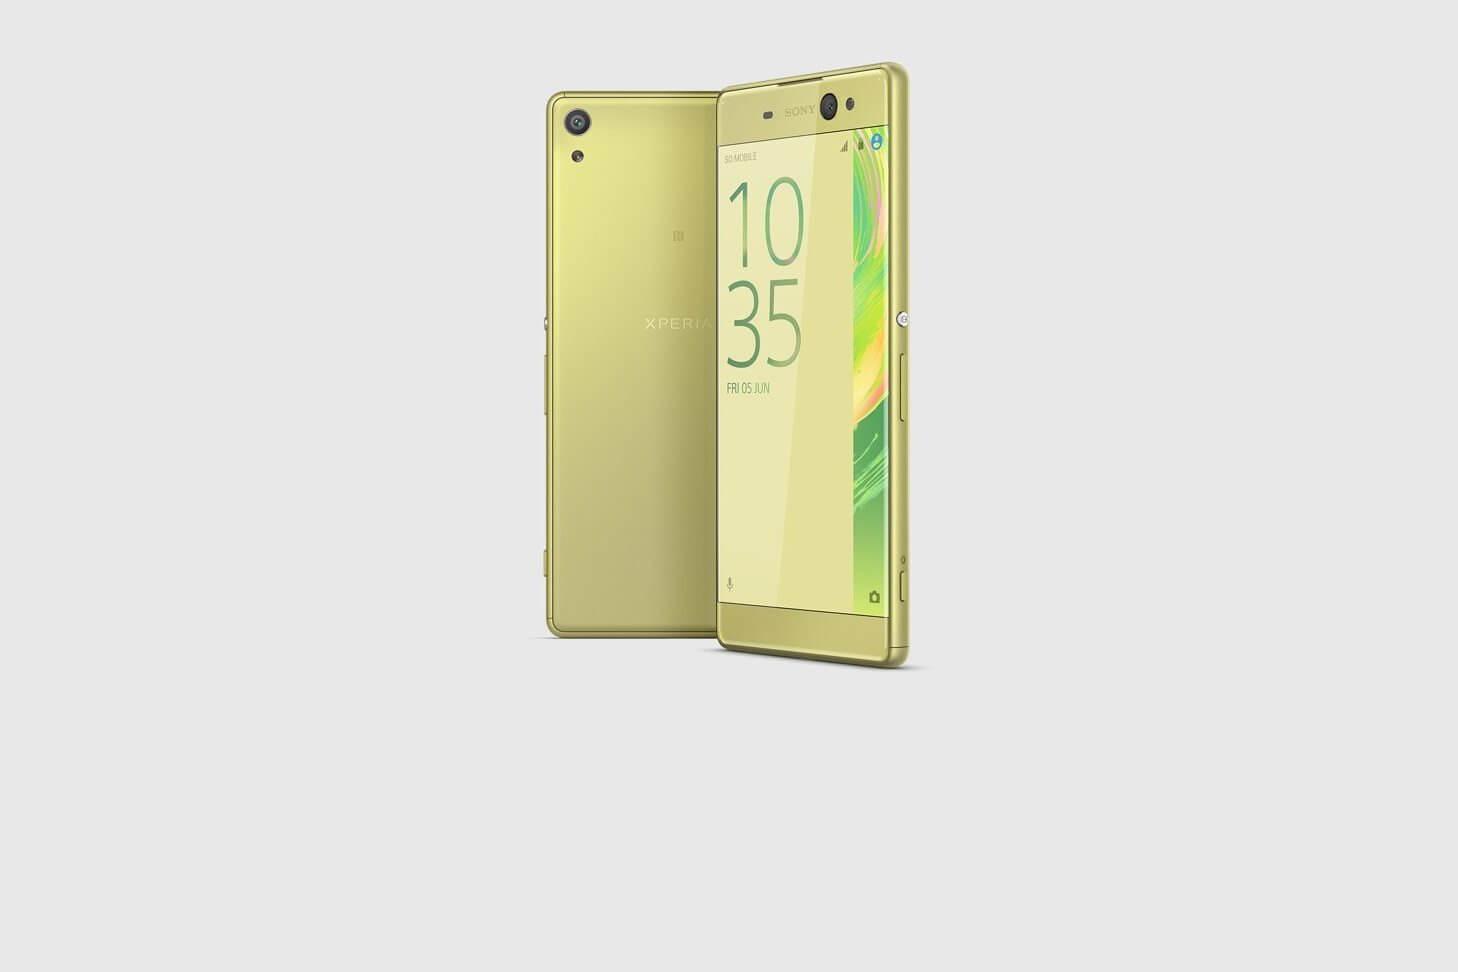 smt sony xperia xa ultra p03 - Sony apresenta Xperia XA Ultra, seu phablet bom de selfie